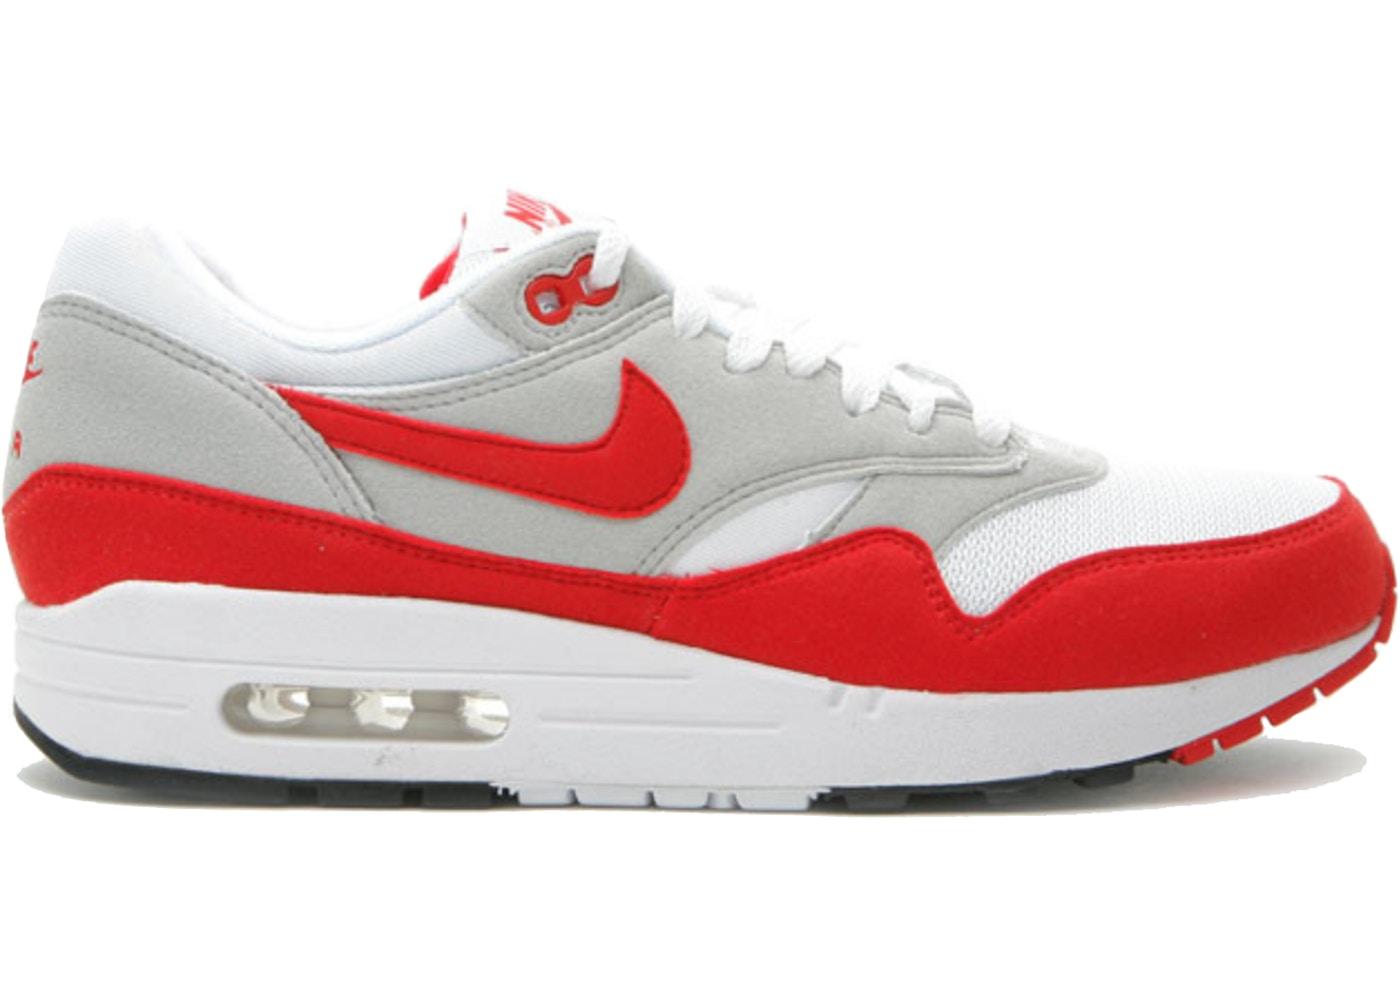 Air Max 1 Sport Red (2009) - 378830-161 ea71575f0245